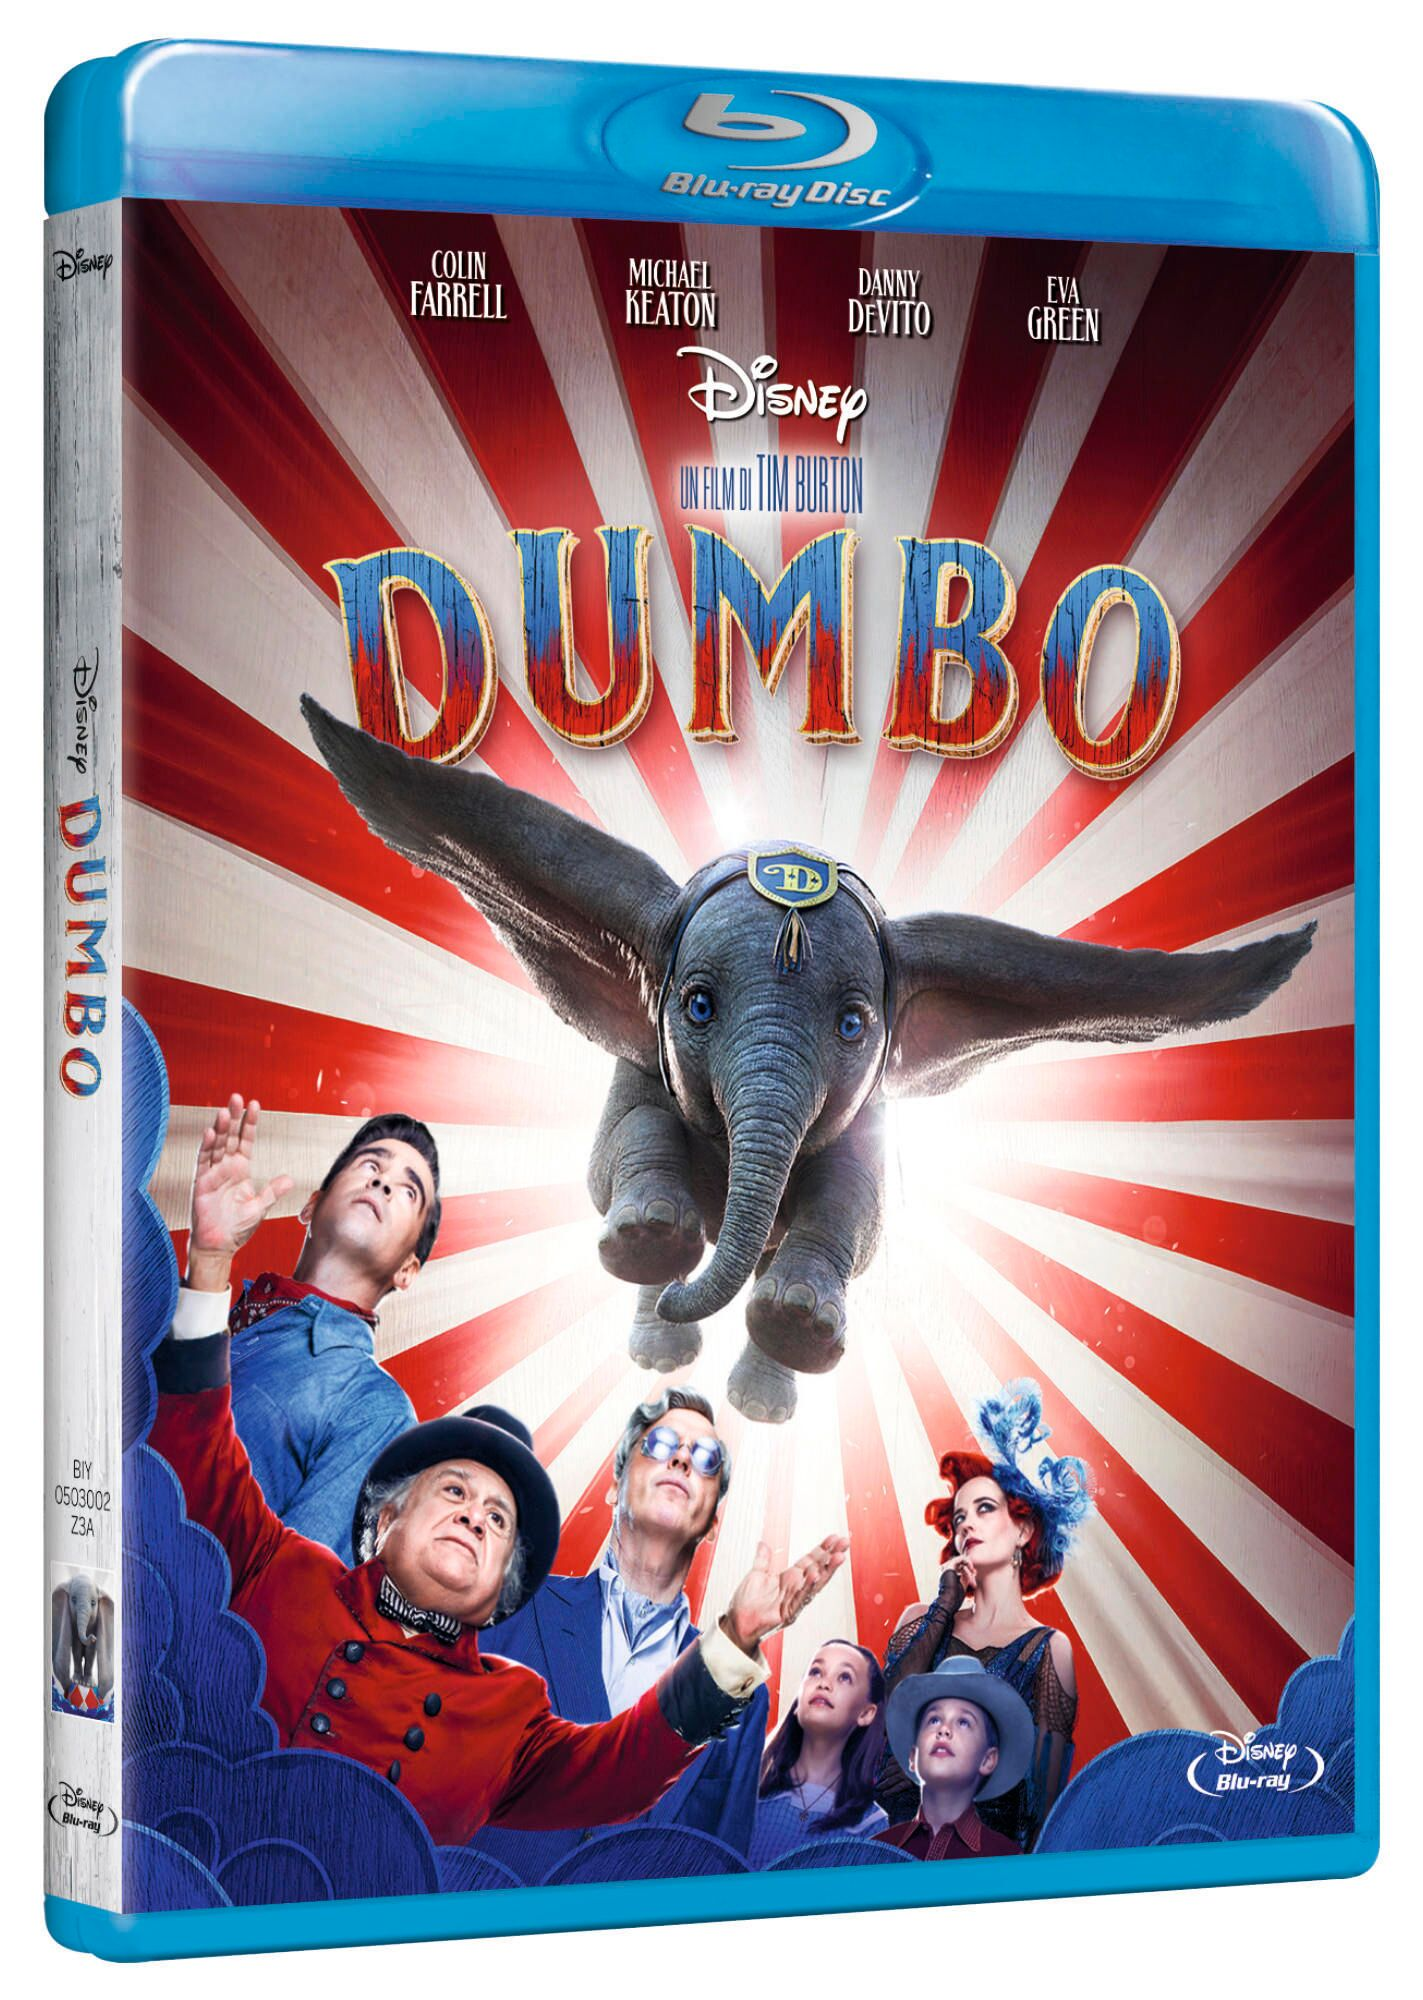 Dumbo Home video